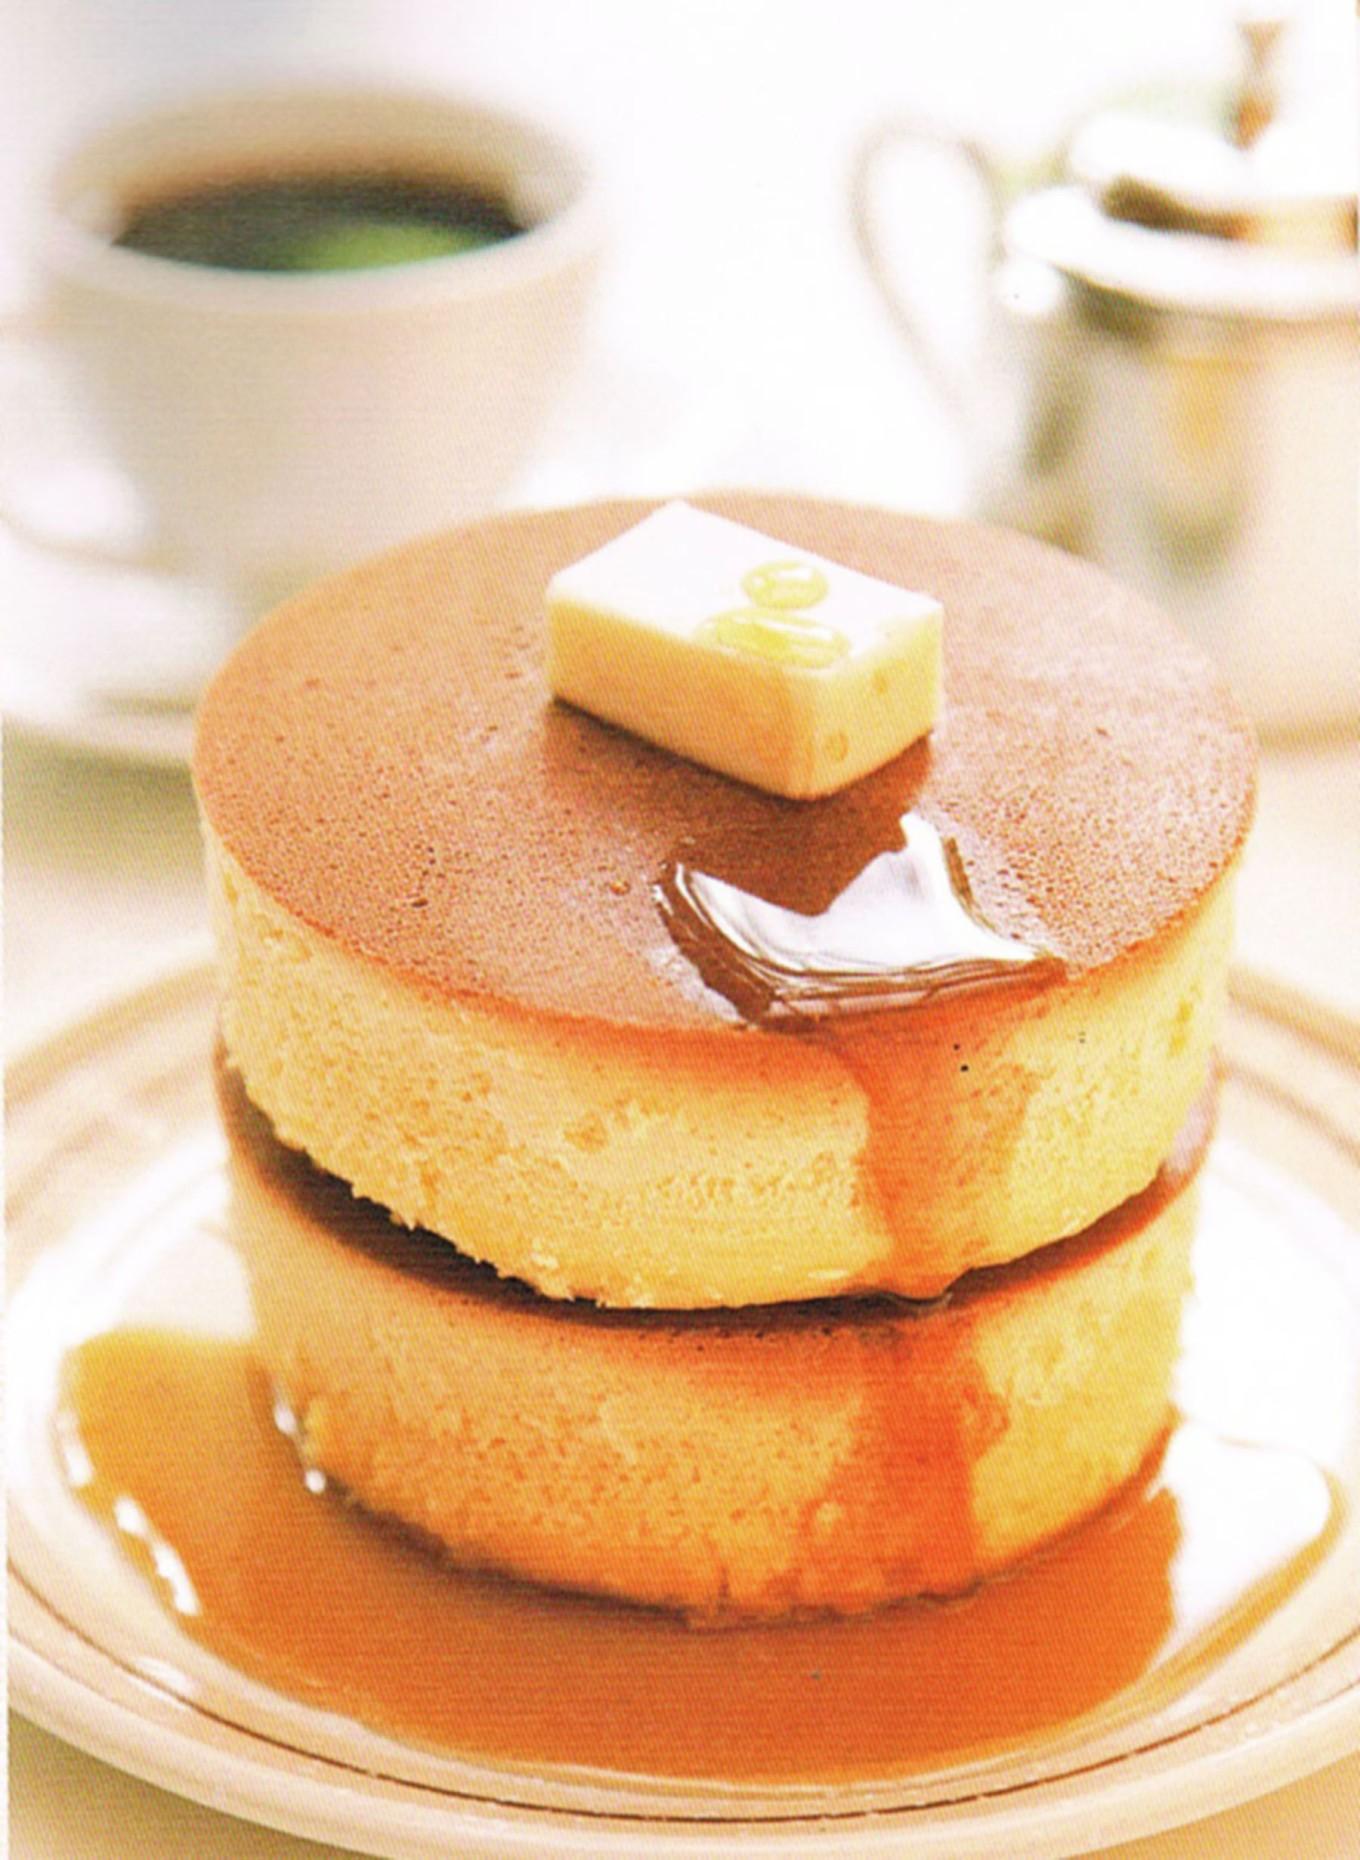 PancakeDouble